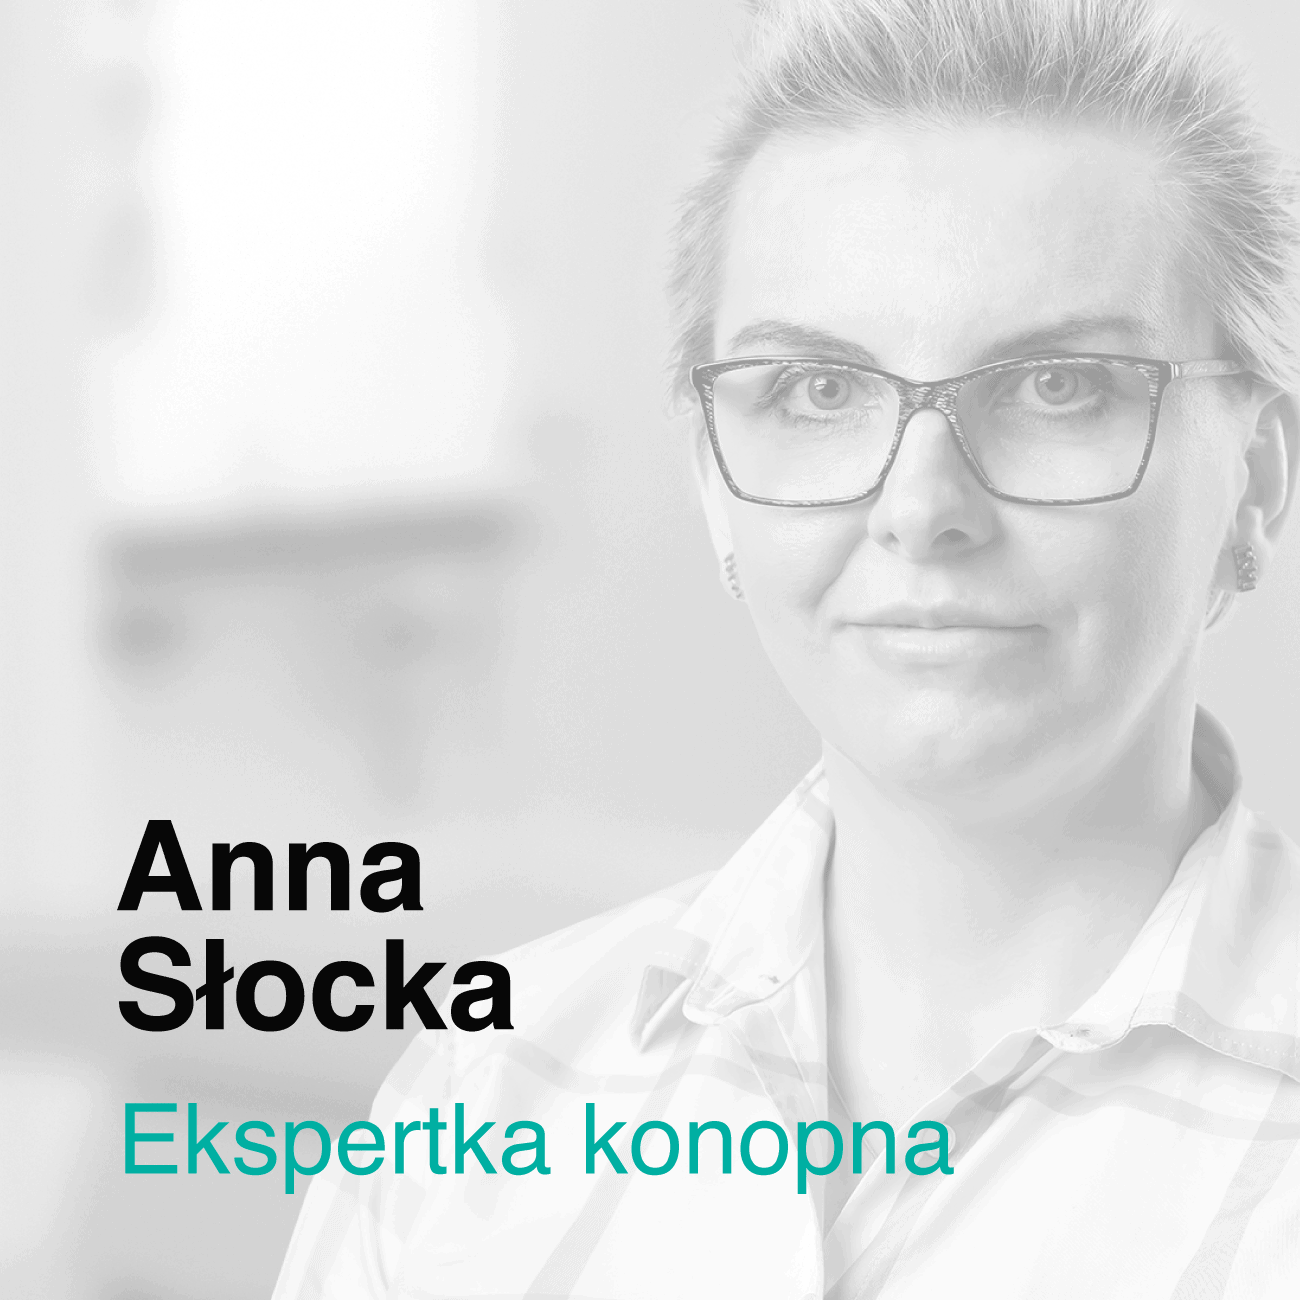 Anna Słocka Medicana - ekspertka konopna